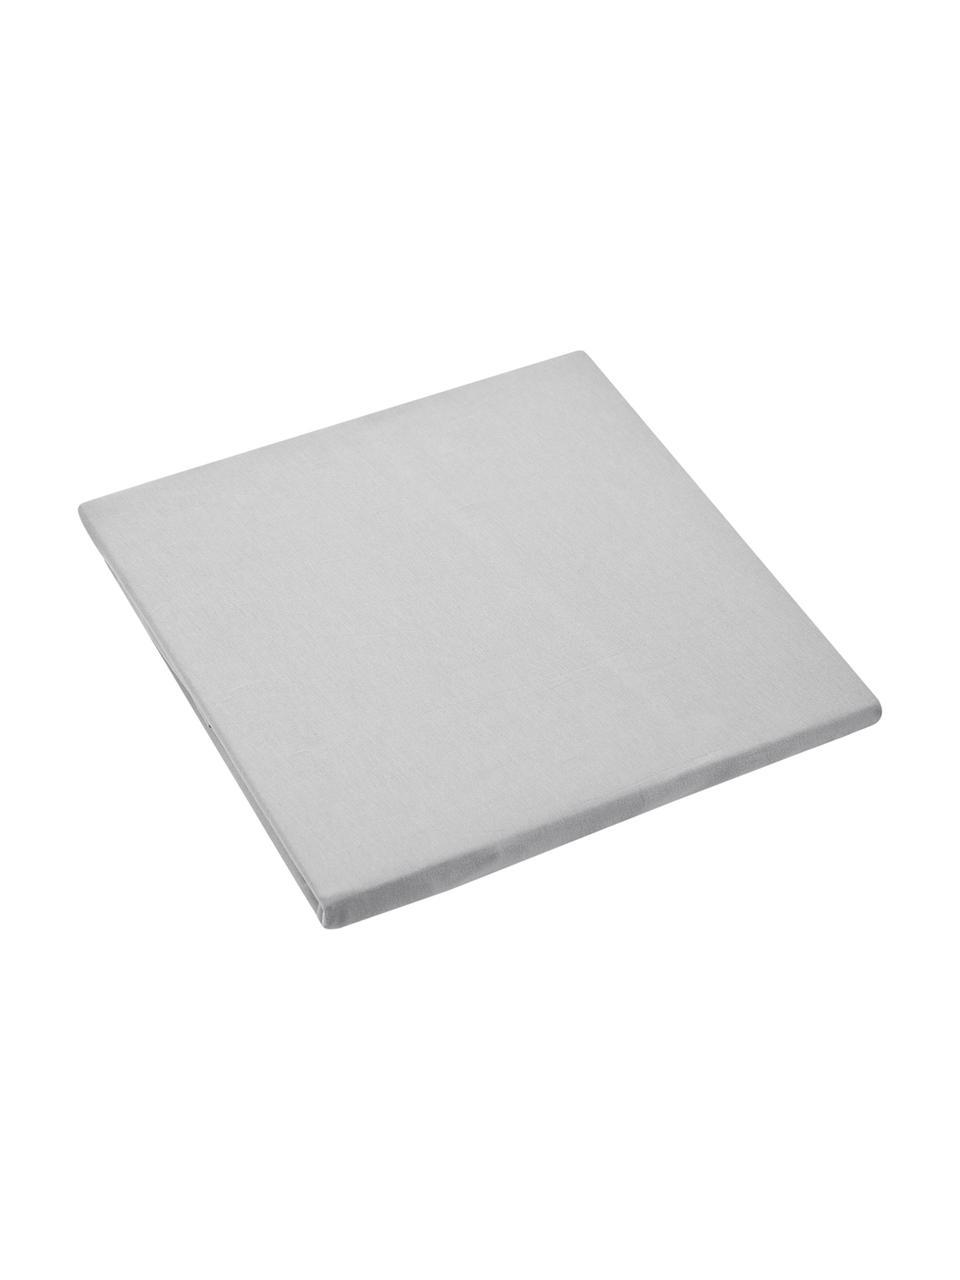 Lenzuolo con angoli in jersey-elastan grigio chiaro Lara, 95% cotone, 5% elastan, Grigio chiaro, Larg. 90-100 x Lung. 200 cm